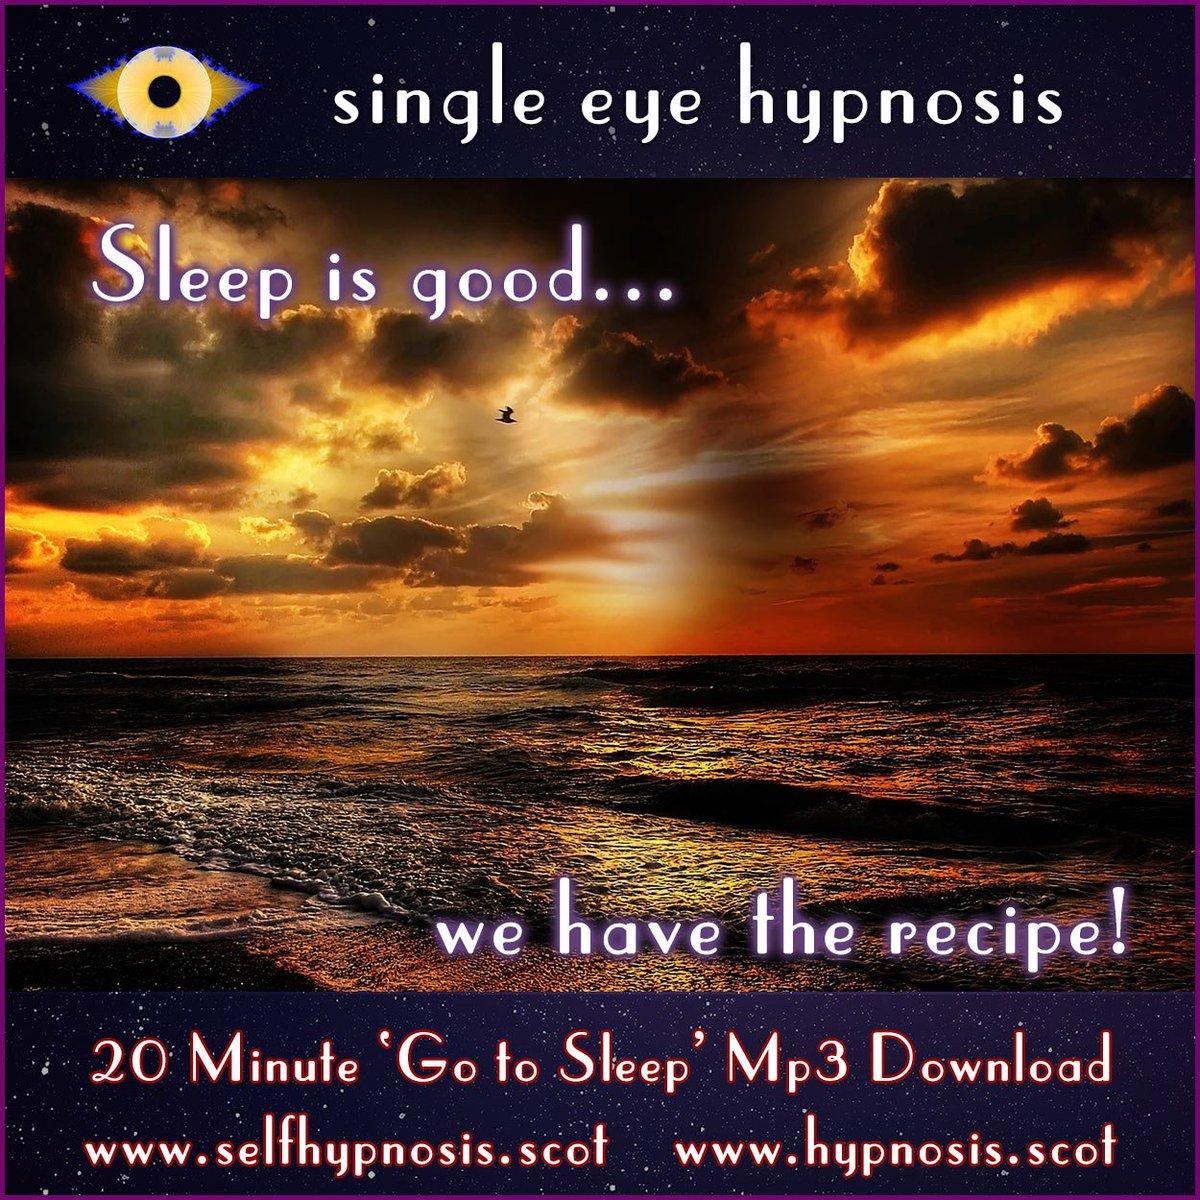 single eye hypnosis on Twitter: